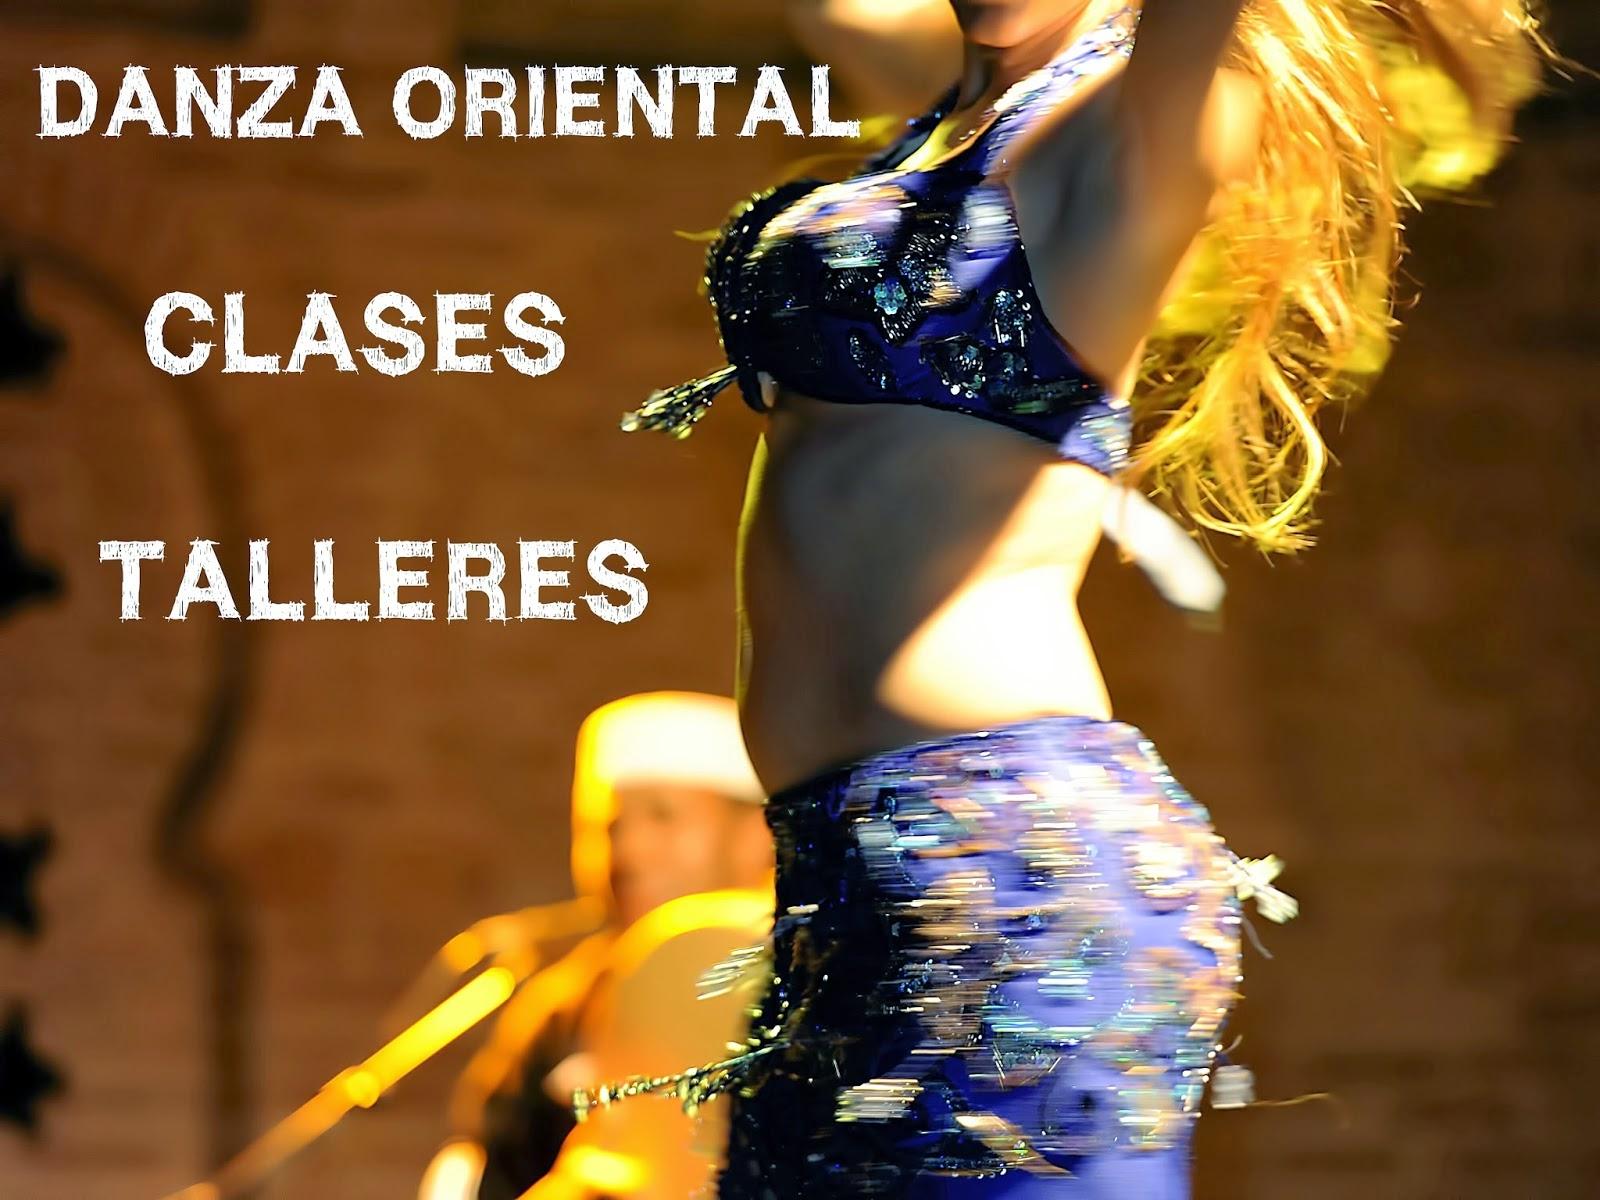 CLASES  TALLERES ESPECTÁCULOS